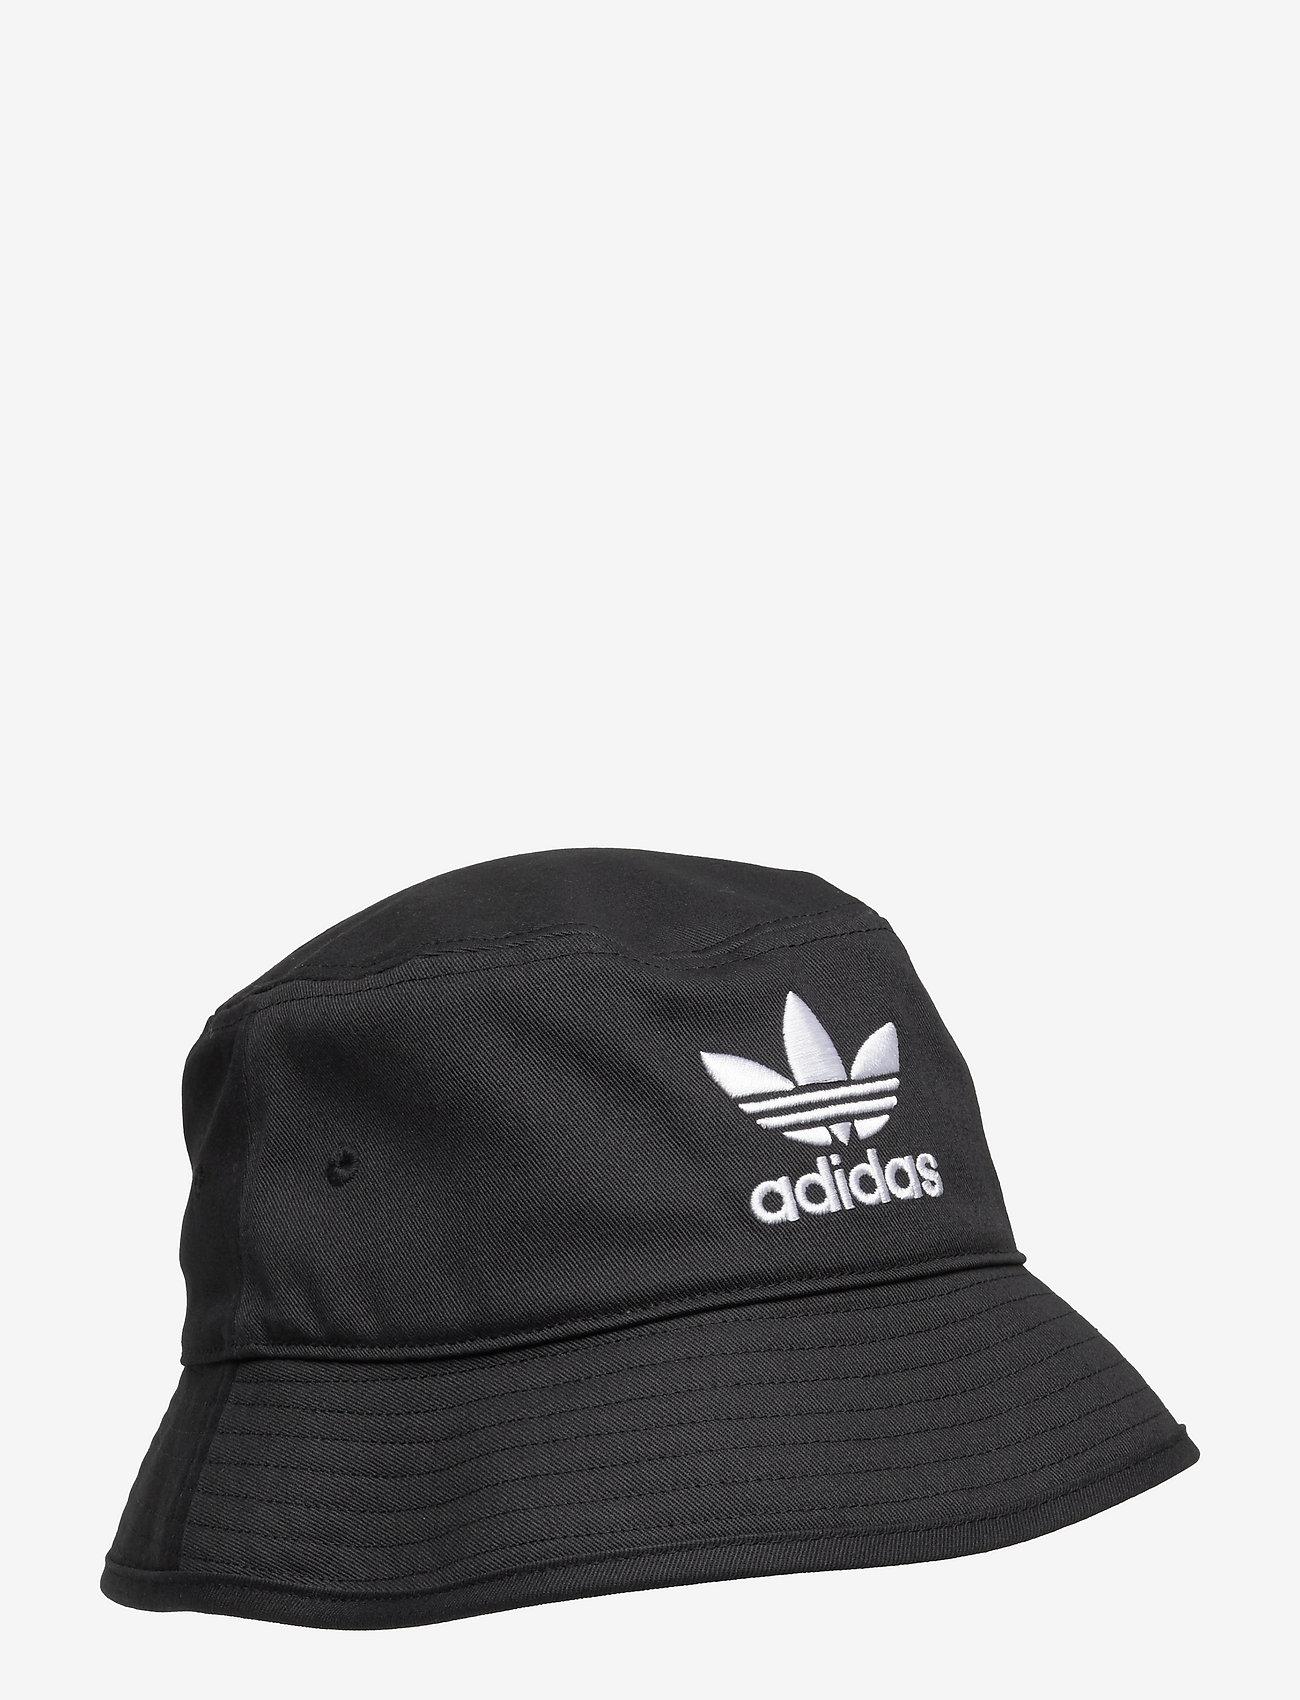 adidas Originals - Adicolor Trefoil Bucket Hat - bucket hats - black/white - 0